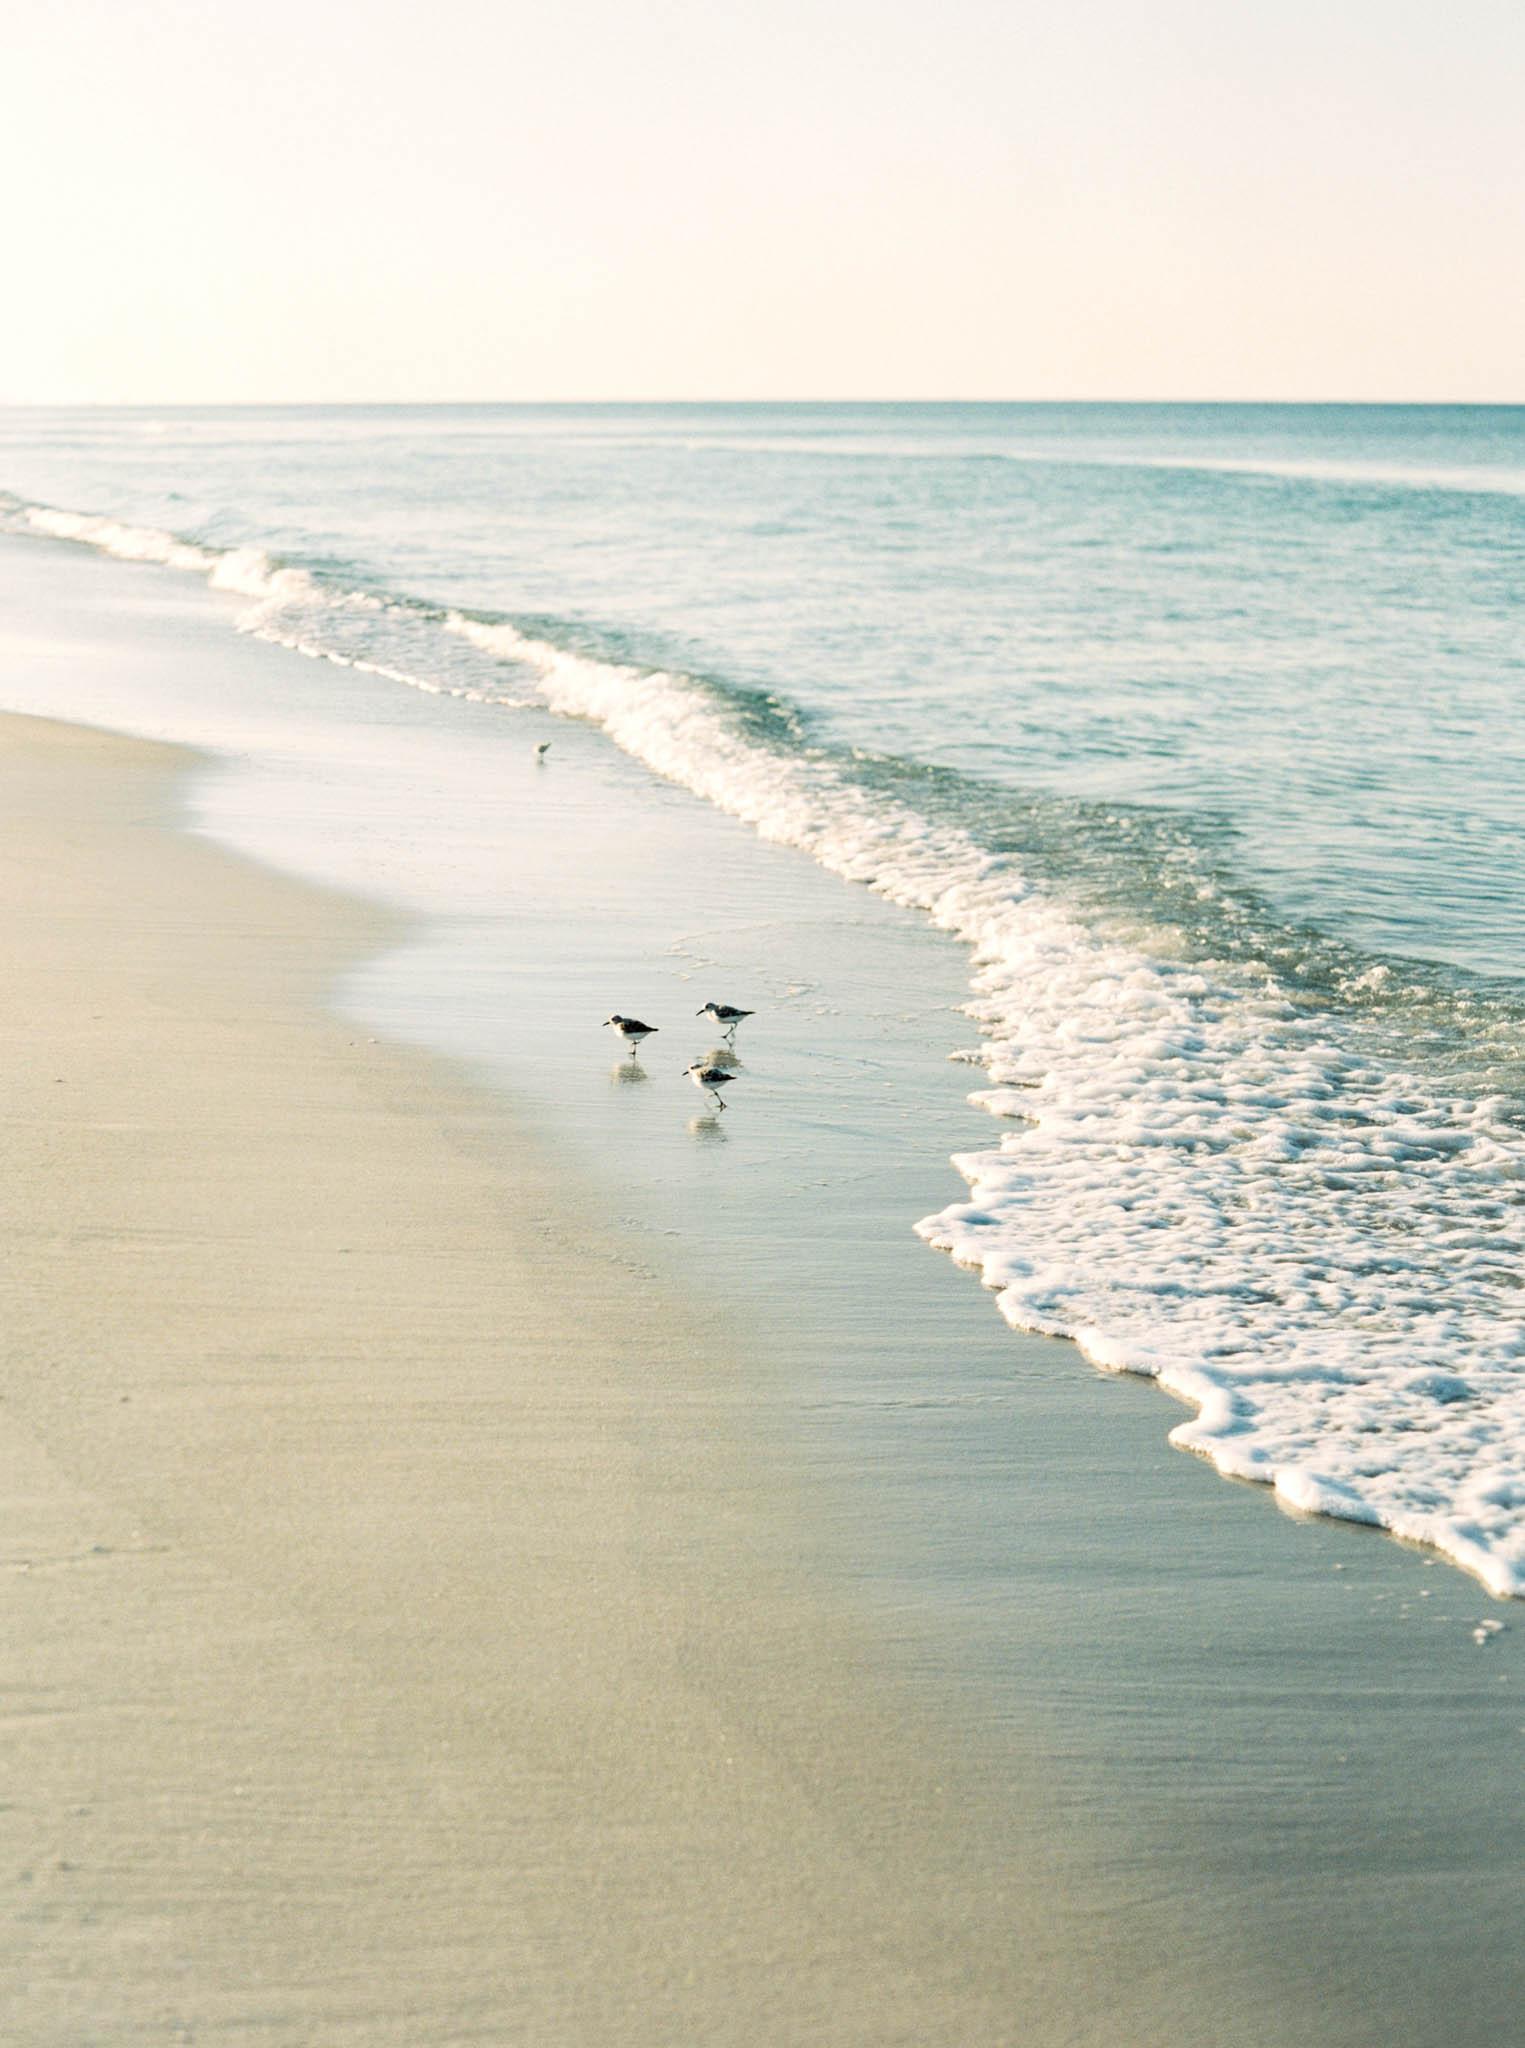 Rosemary shoreline | Shot on Fuji 400 film